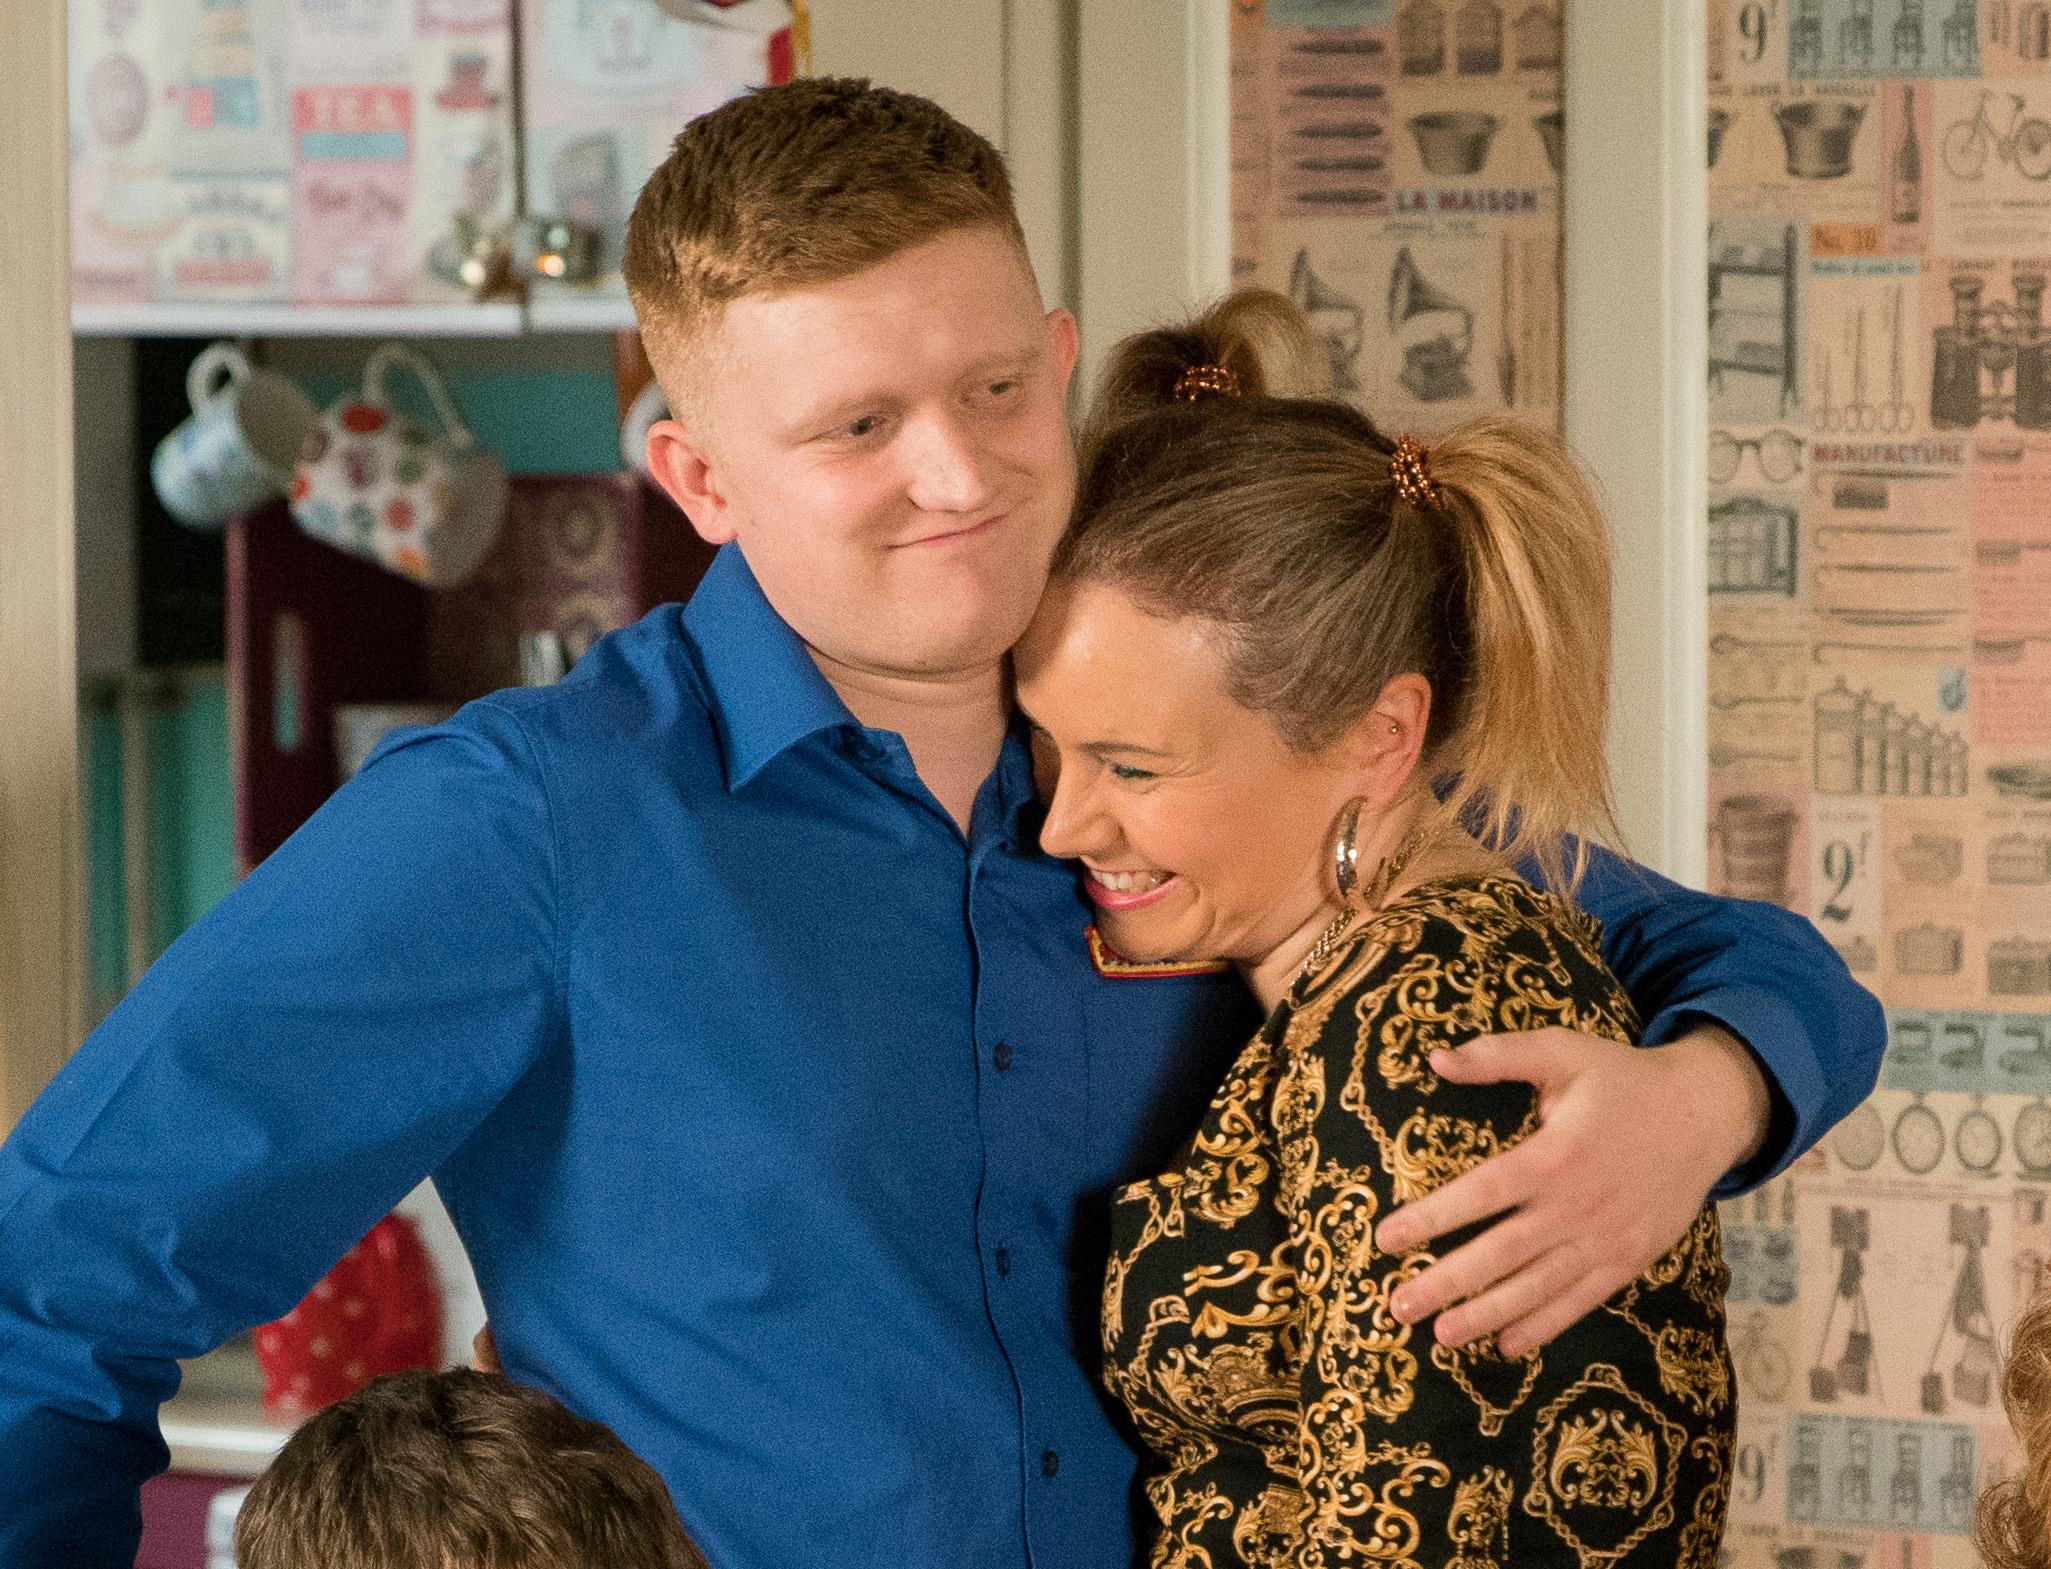 Coronation Street spoilers: Devastating split for Chesney and Gemma ahead of pregnancy storyline?